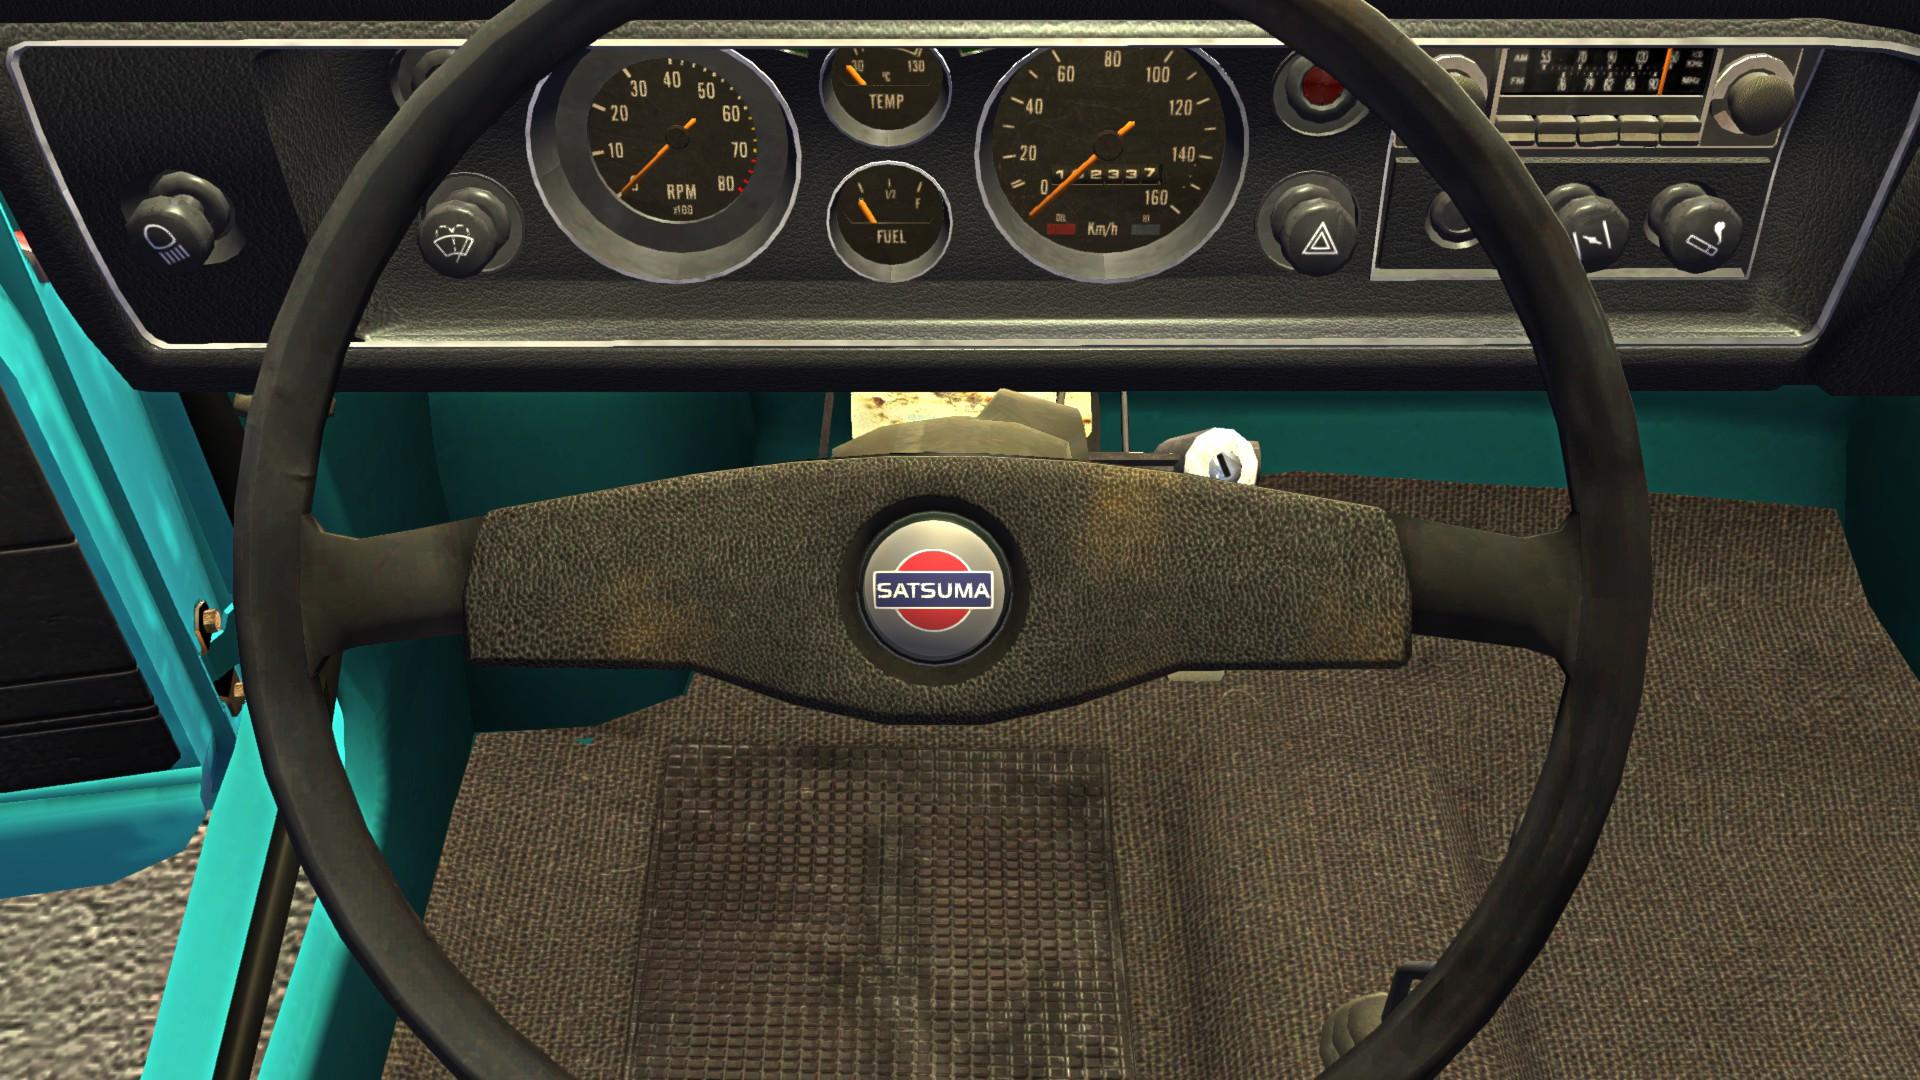 Satsuma Steering Wheel Cap Mod My Summer Car Mods